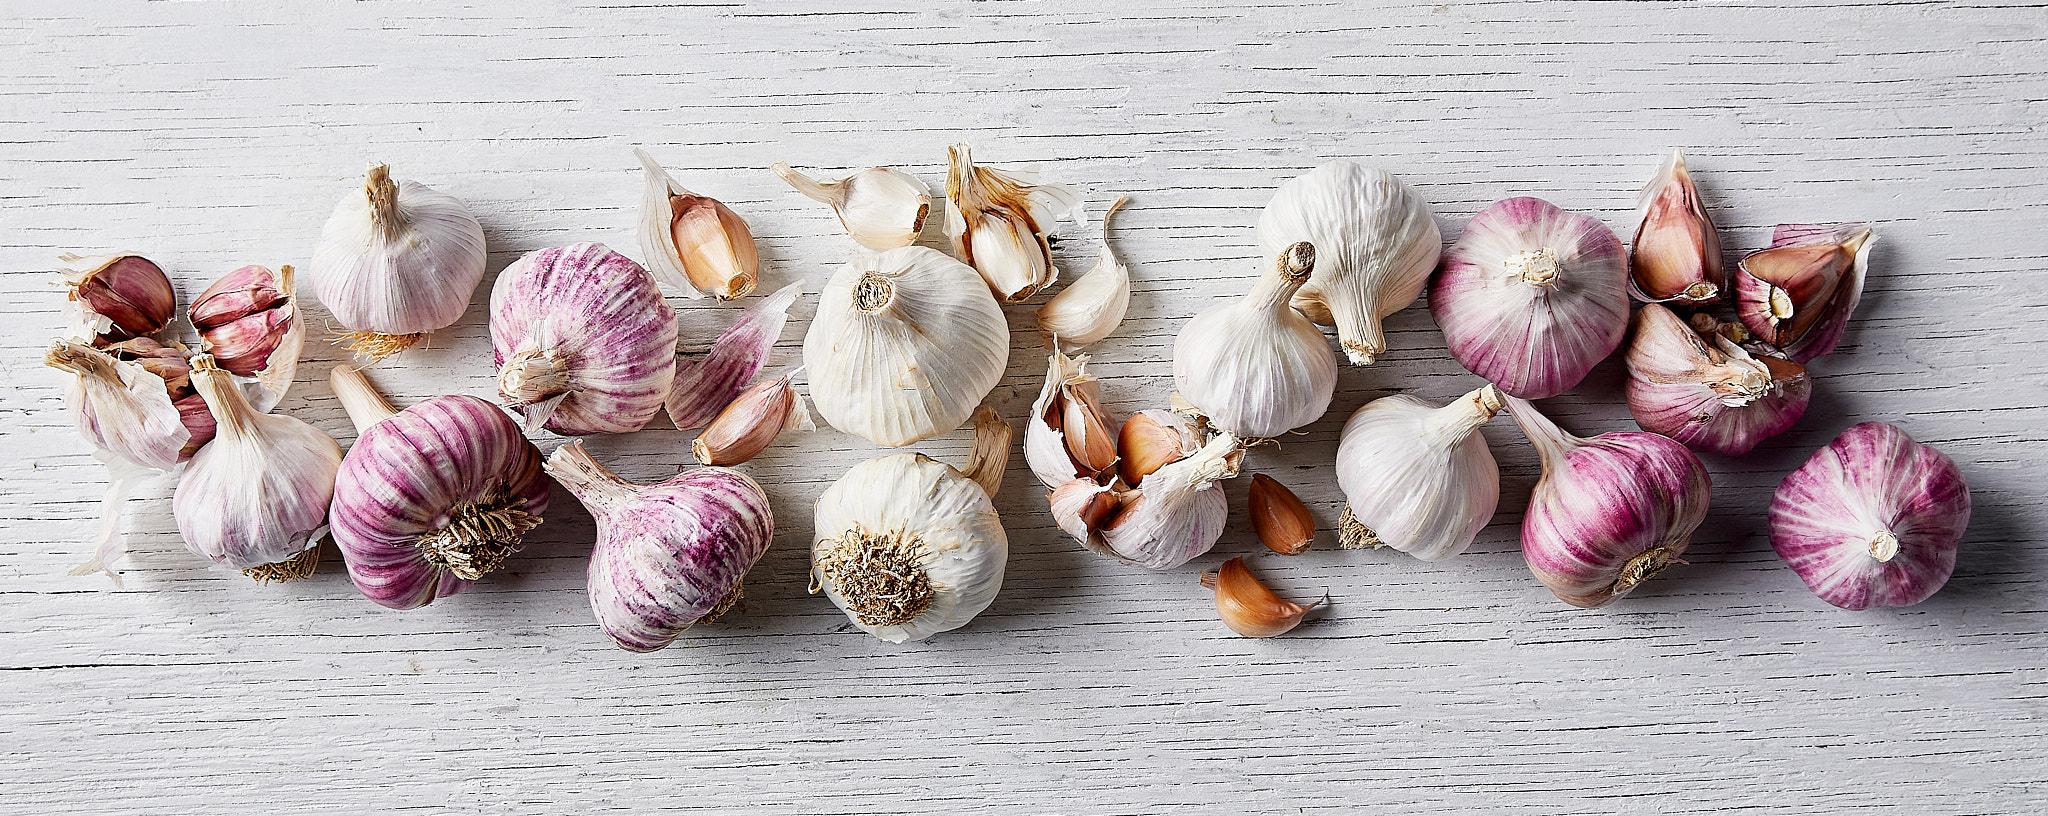 SupaG Garlic Group Aust Rose Aust Purple Aust White Mordo Castano